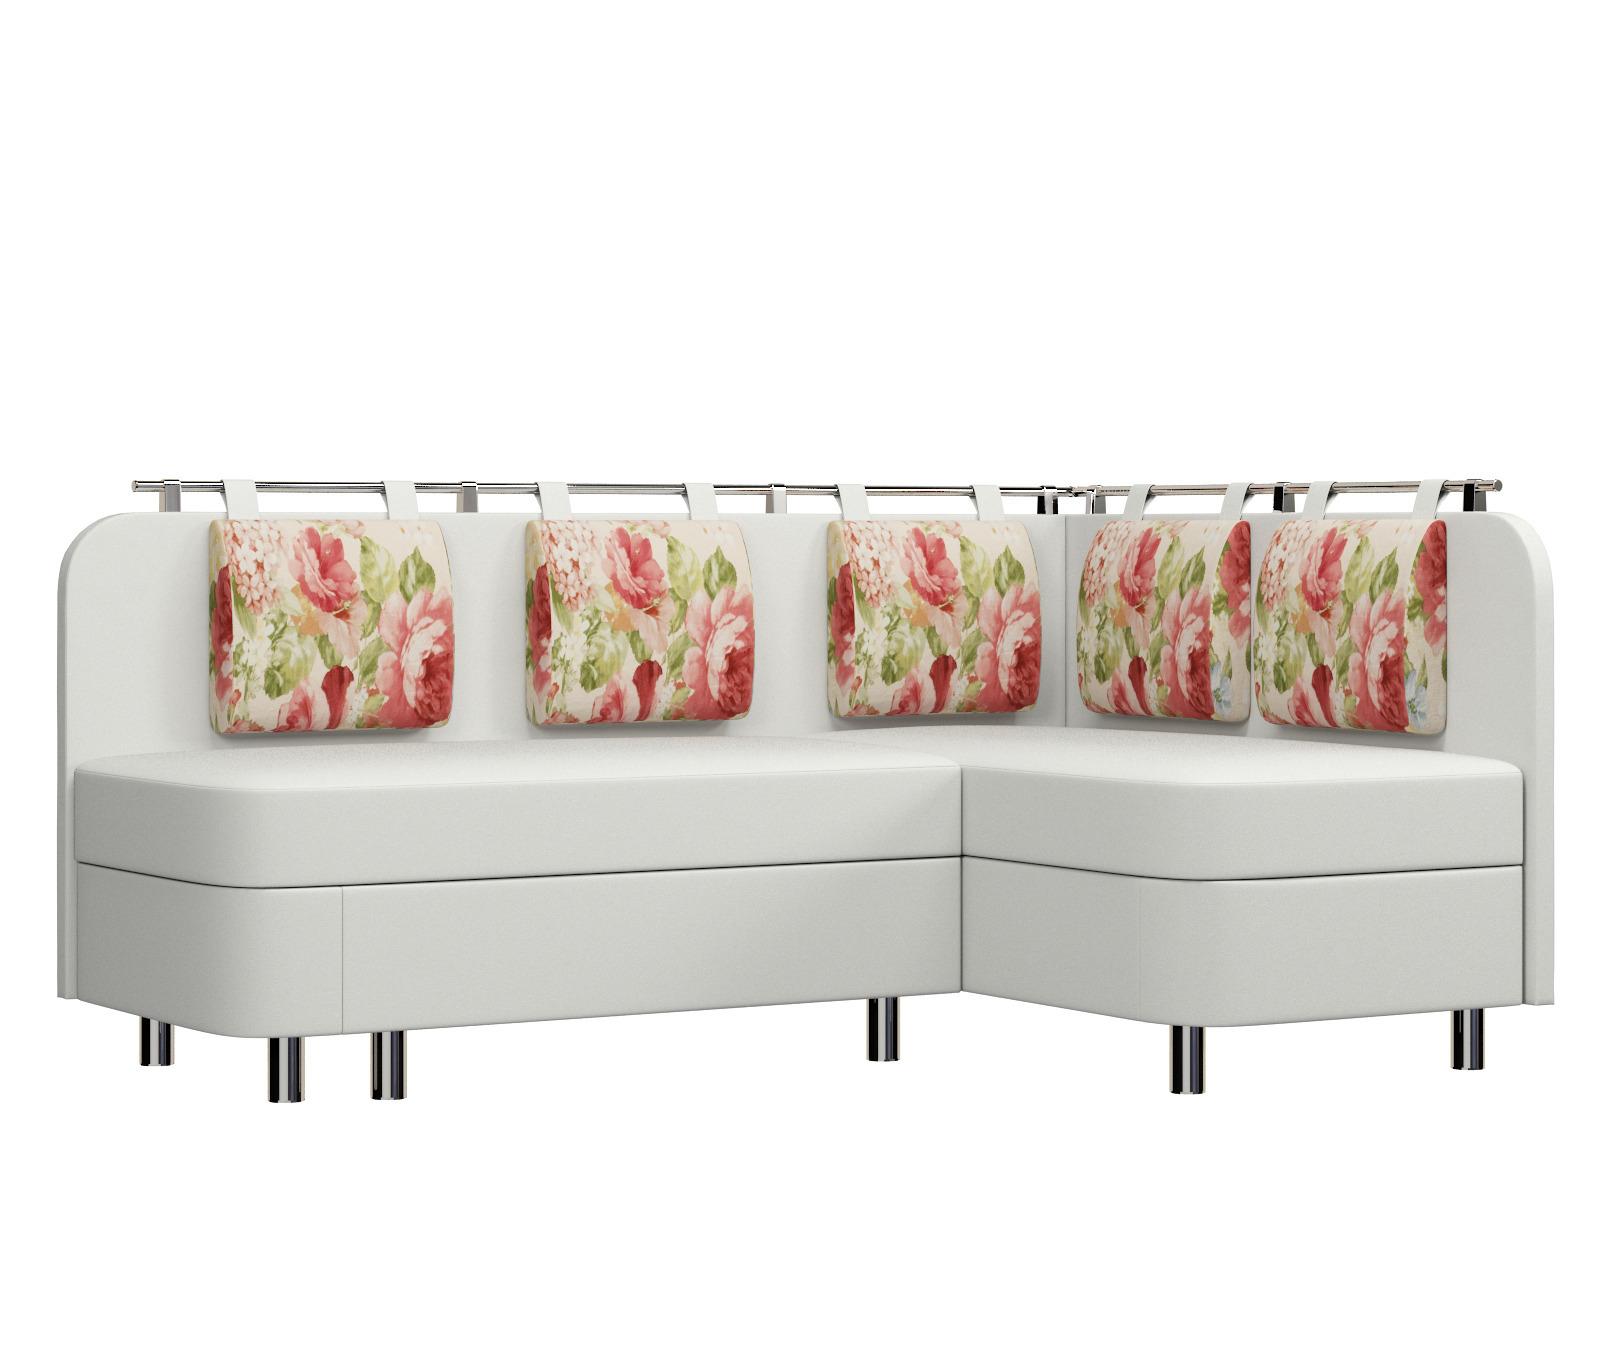 Кухонный уголок Лагуна М2 со спальным местомМягкая мебель<br><br><br>Длина мм: 1810<br>Высота мм: 885<br>Глубина мм: 1210